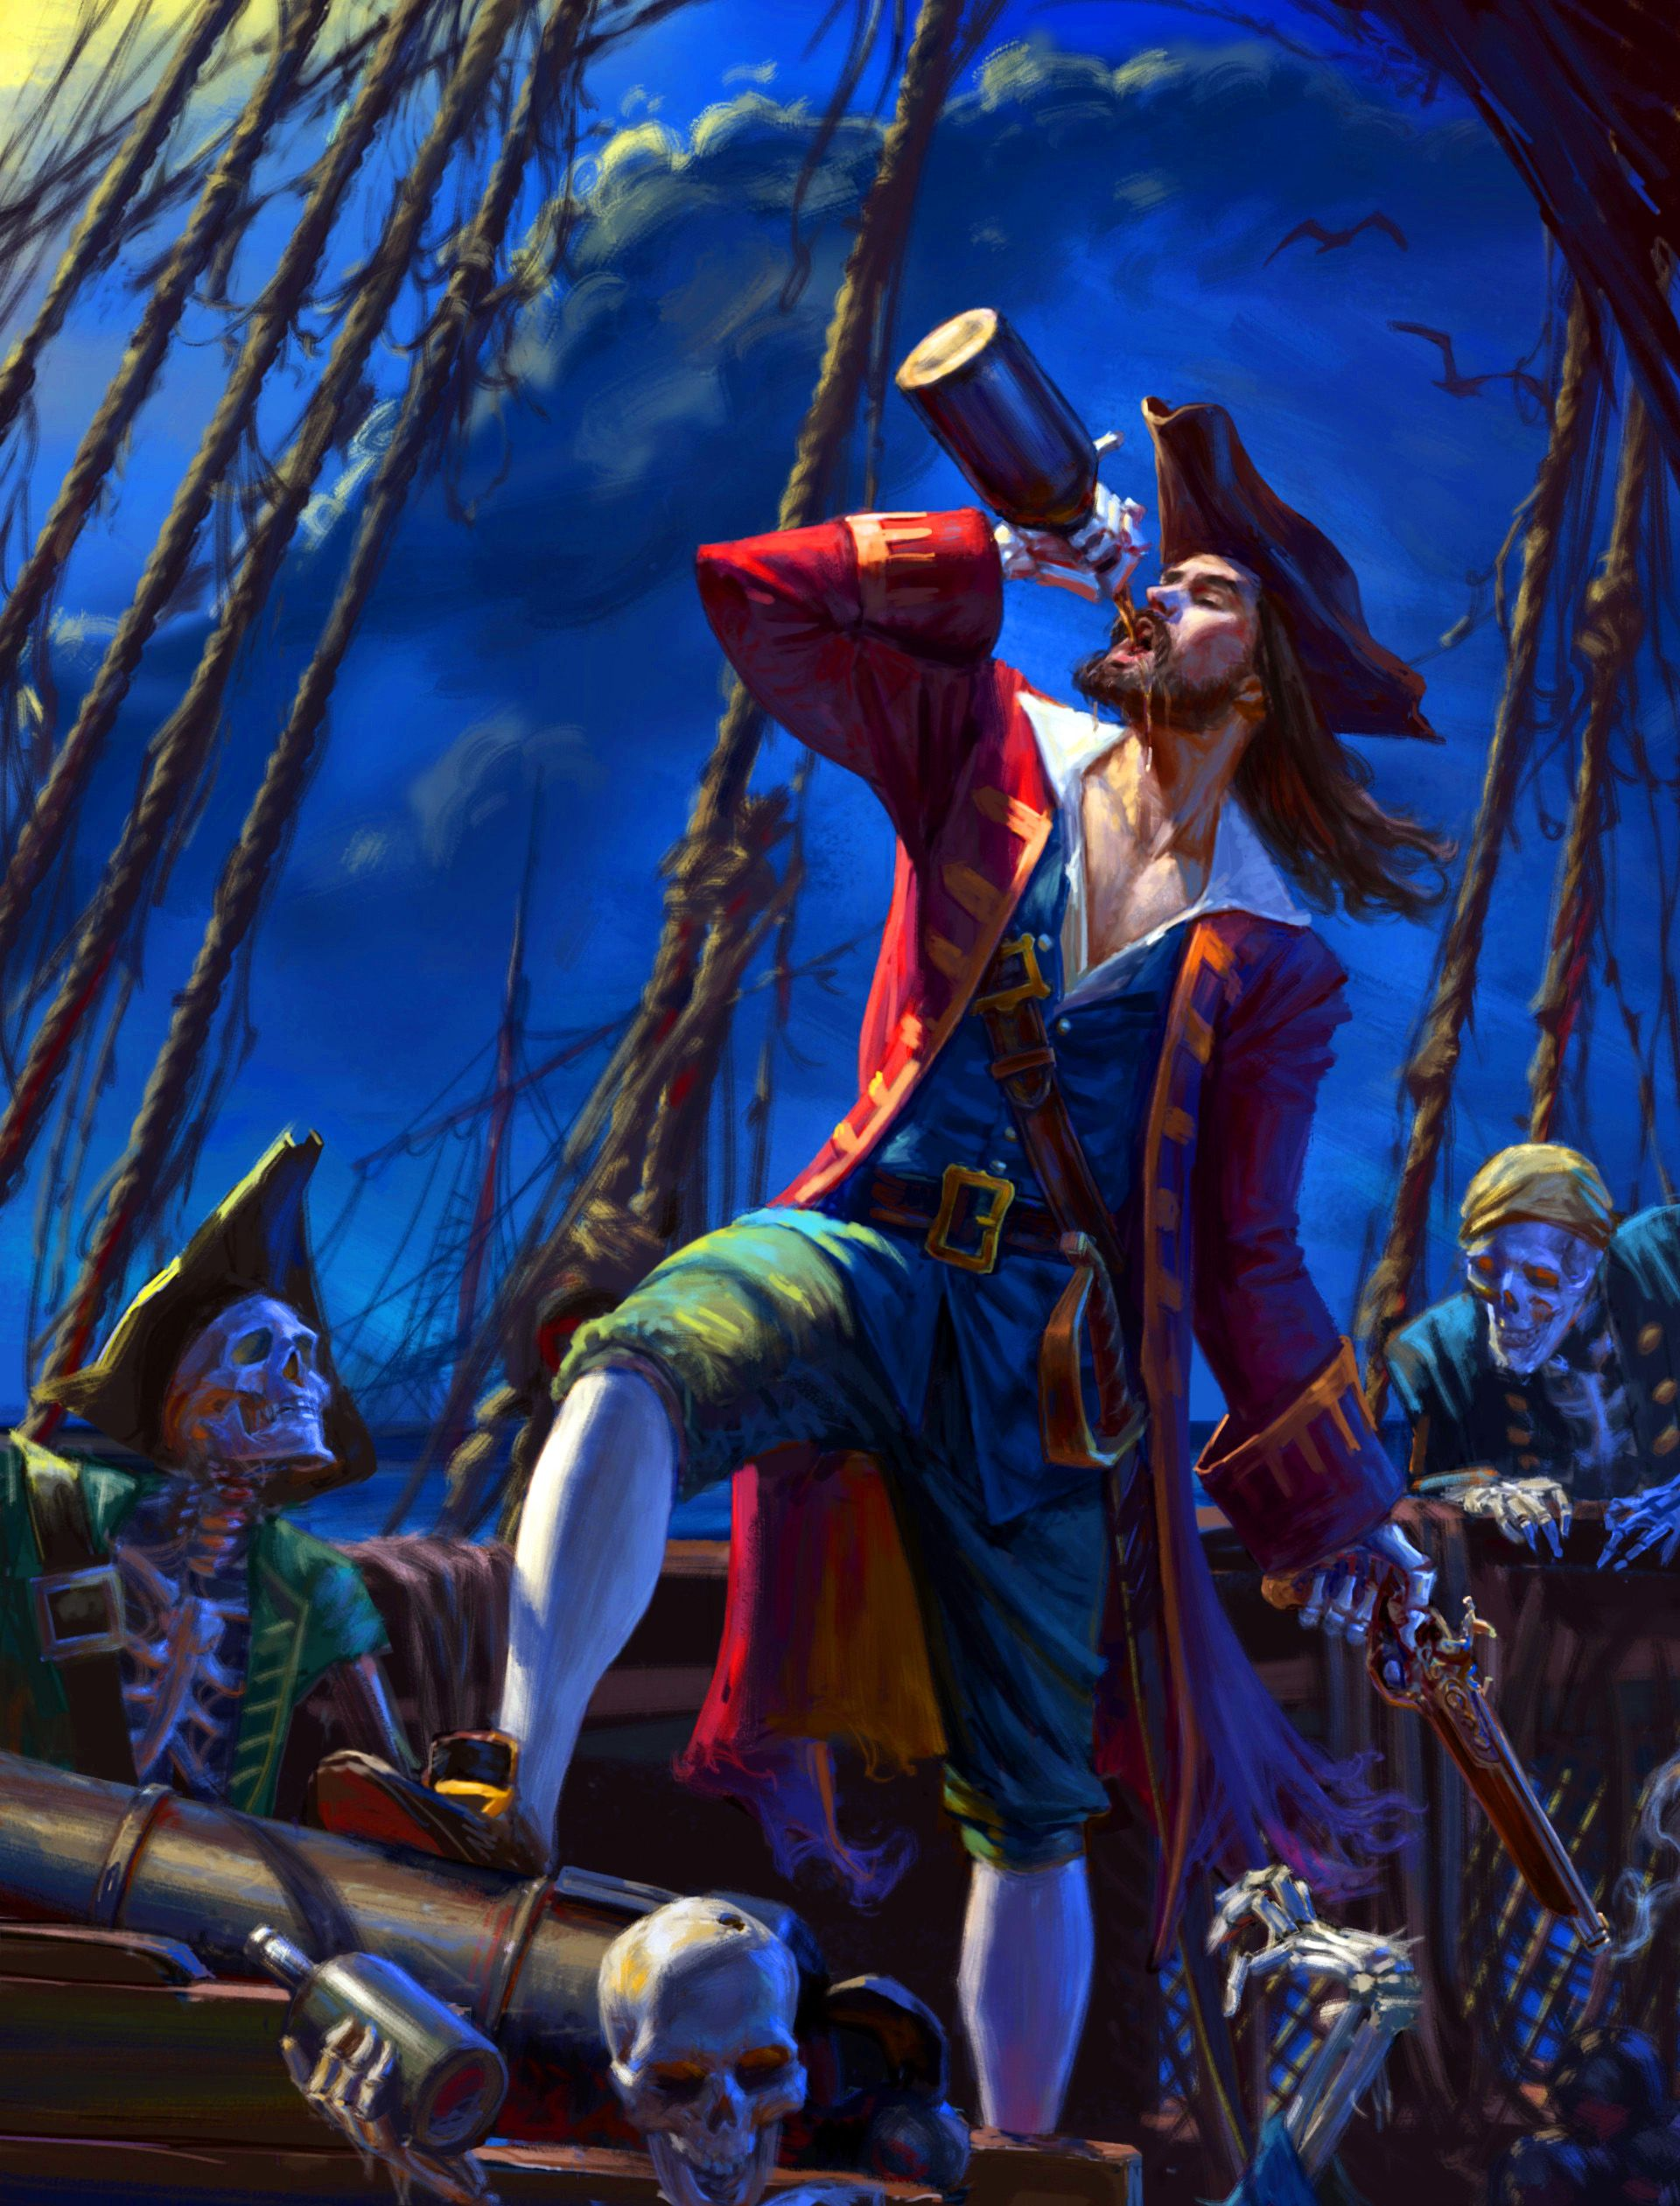 Pirate Becka Bones | Pirate art, Pirate woman, Fantasy